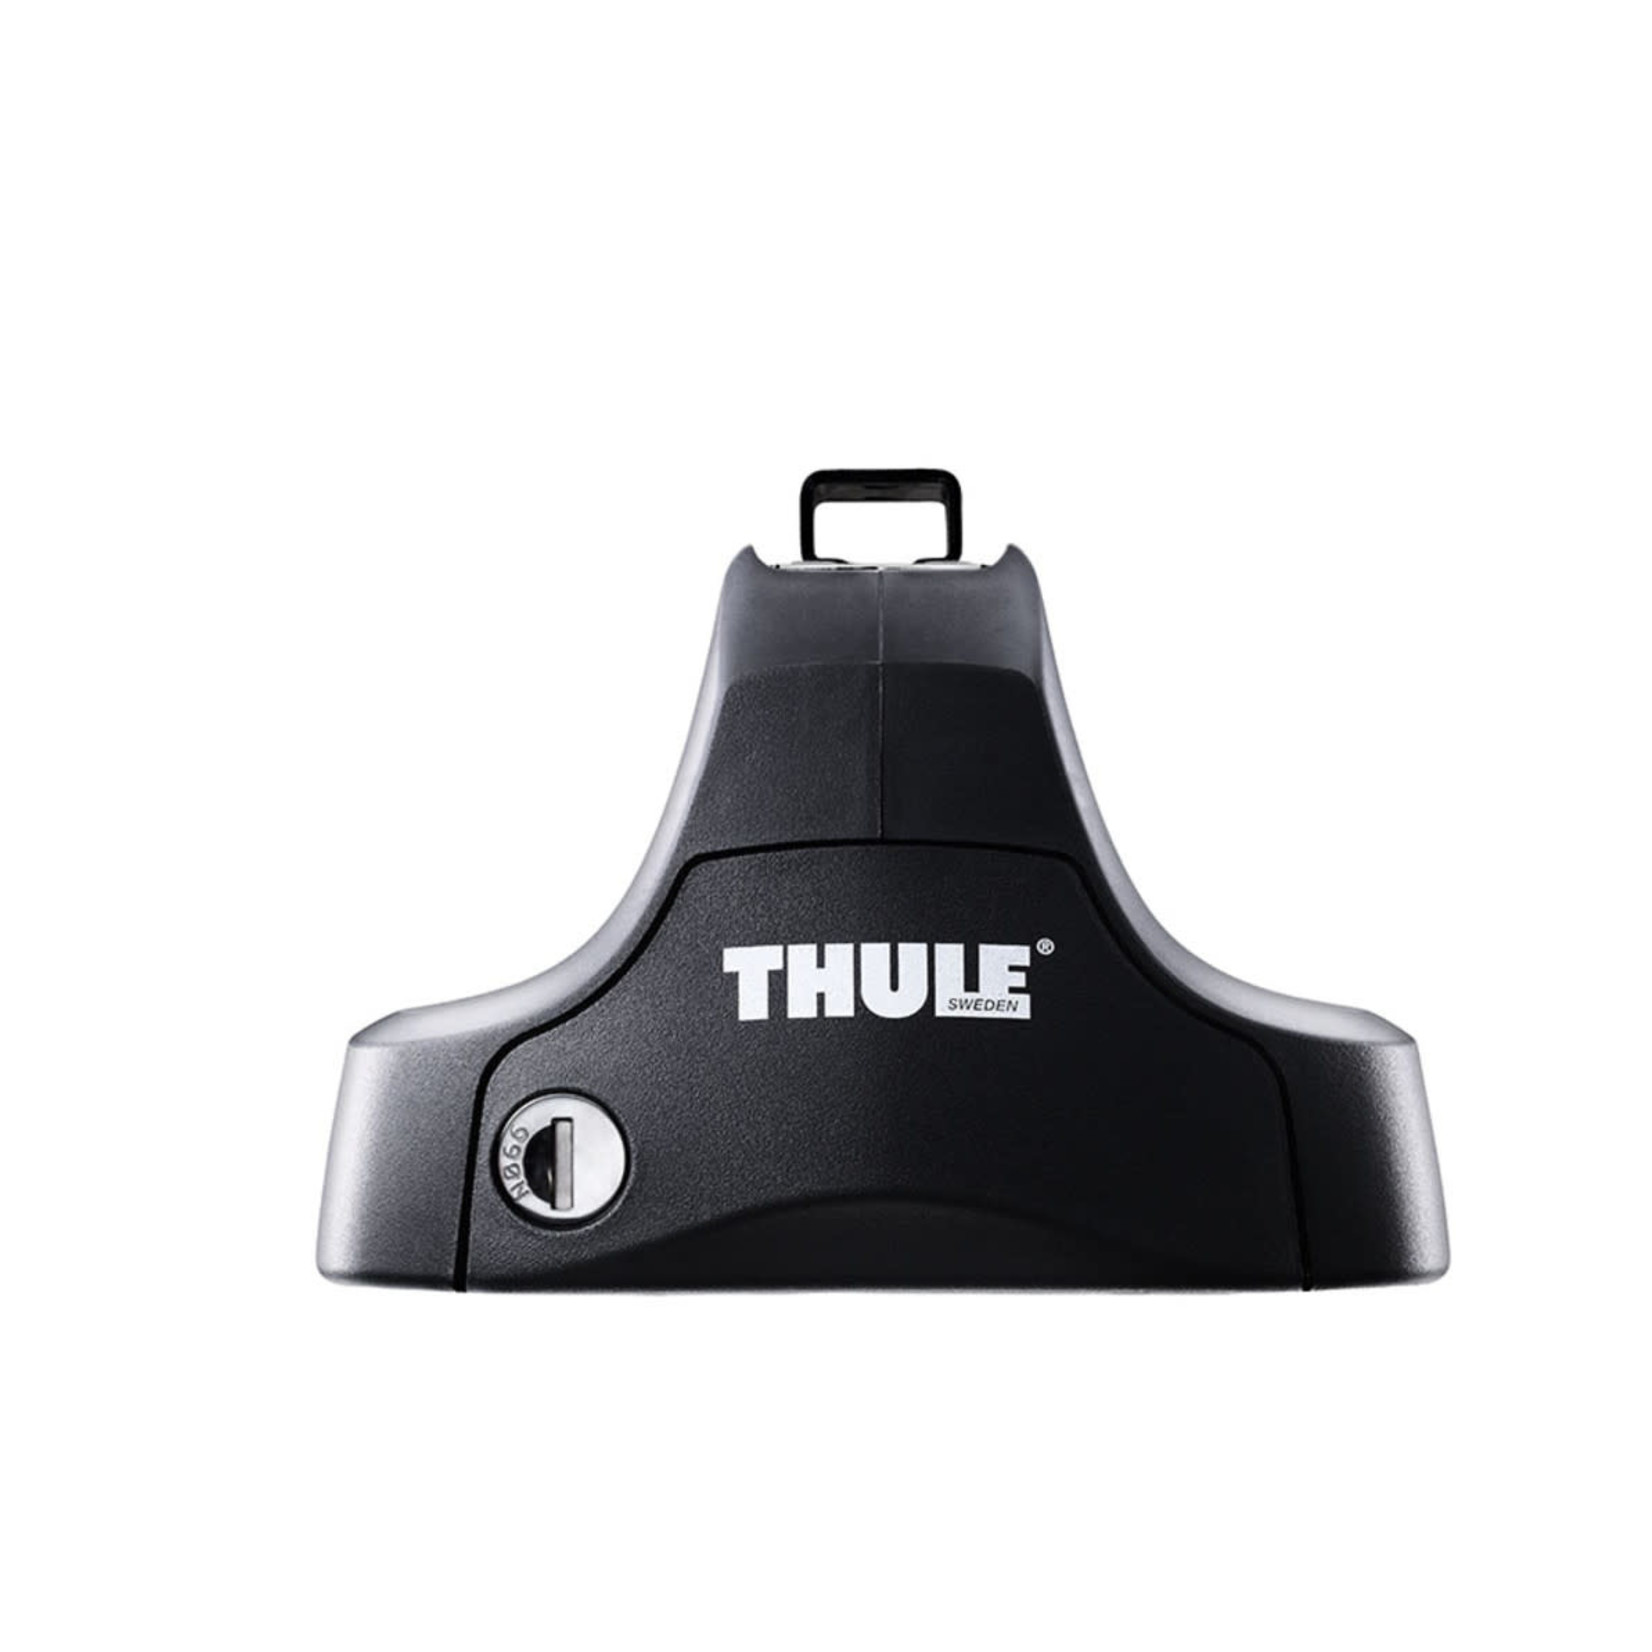 Thule Thule 480R Rapid Traverse Foot Pack Tower Set: Fits Rapid Aero Bars, 4- Pack